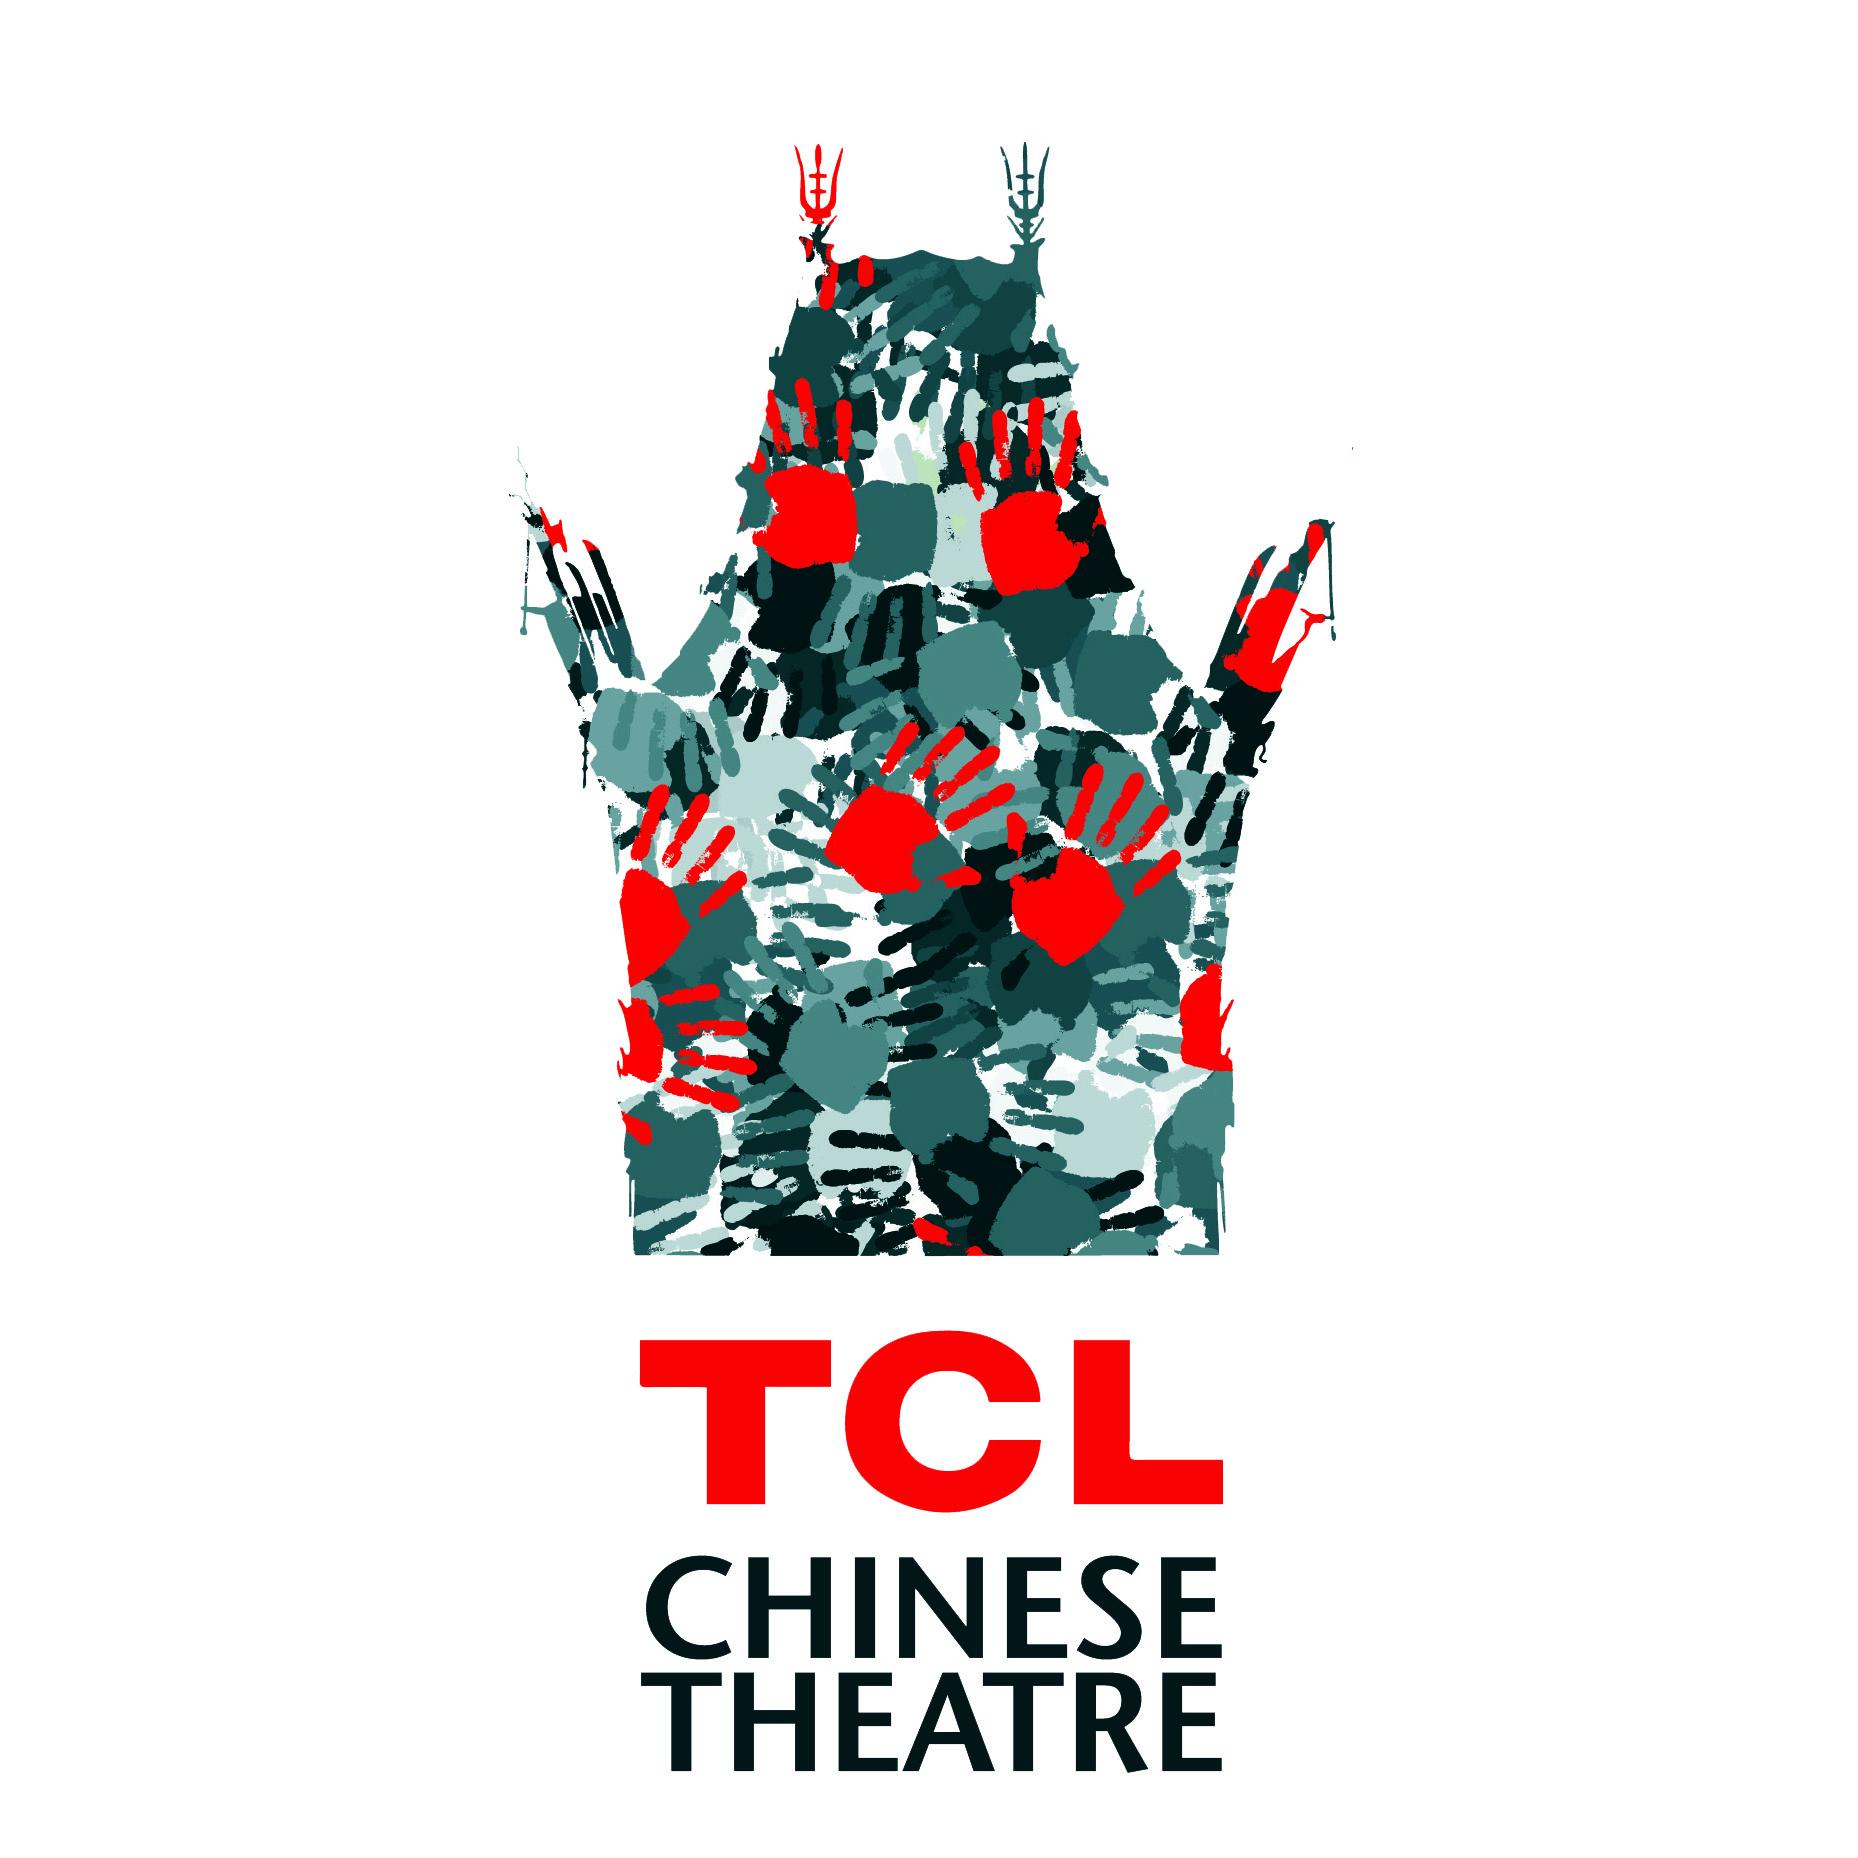 TCL SQUARE.jpg